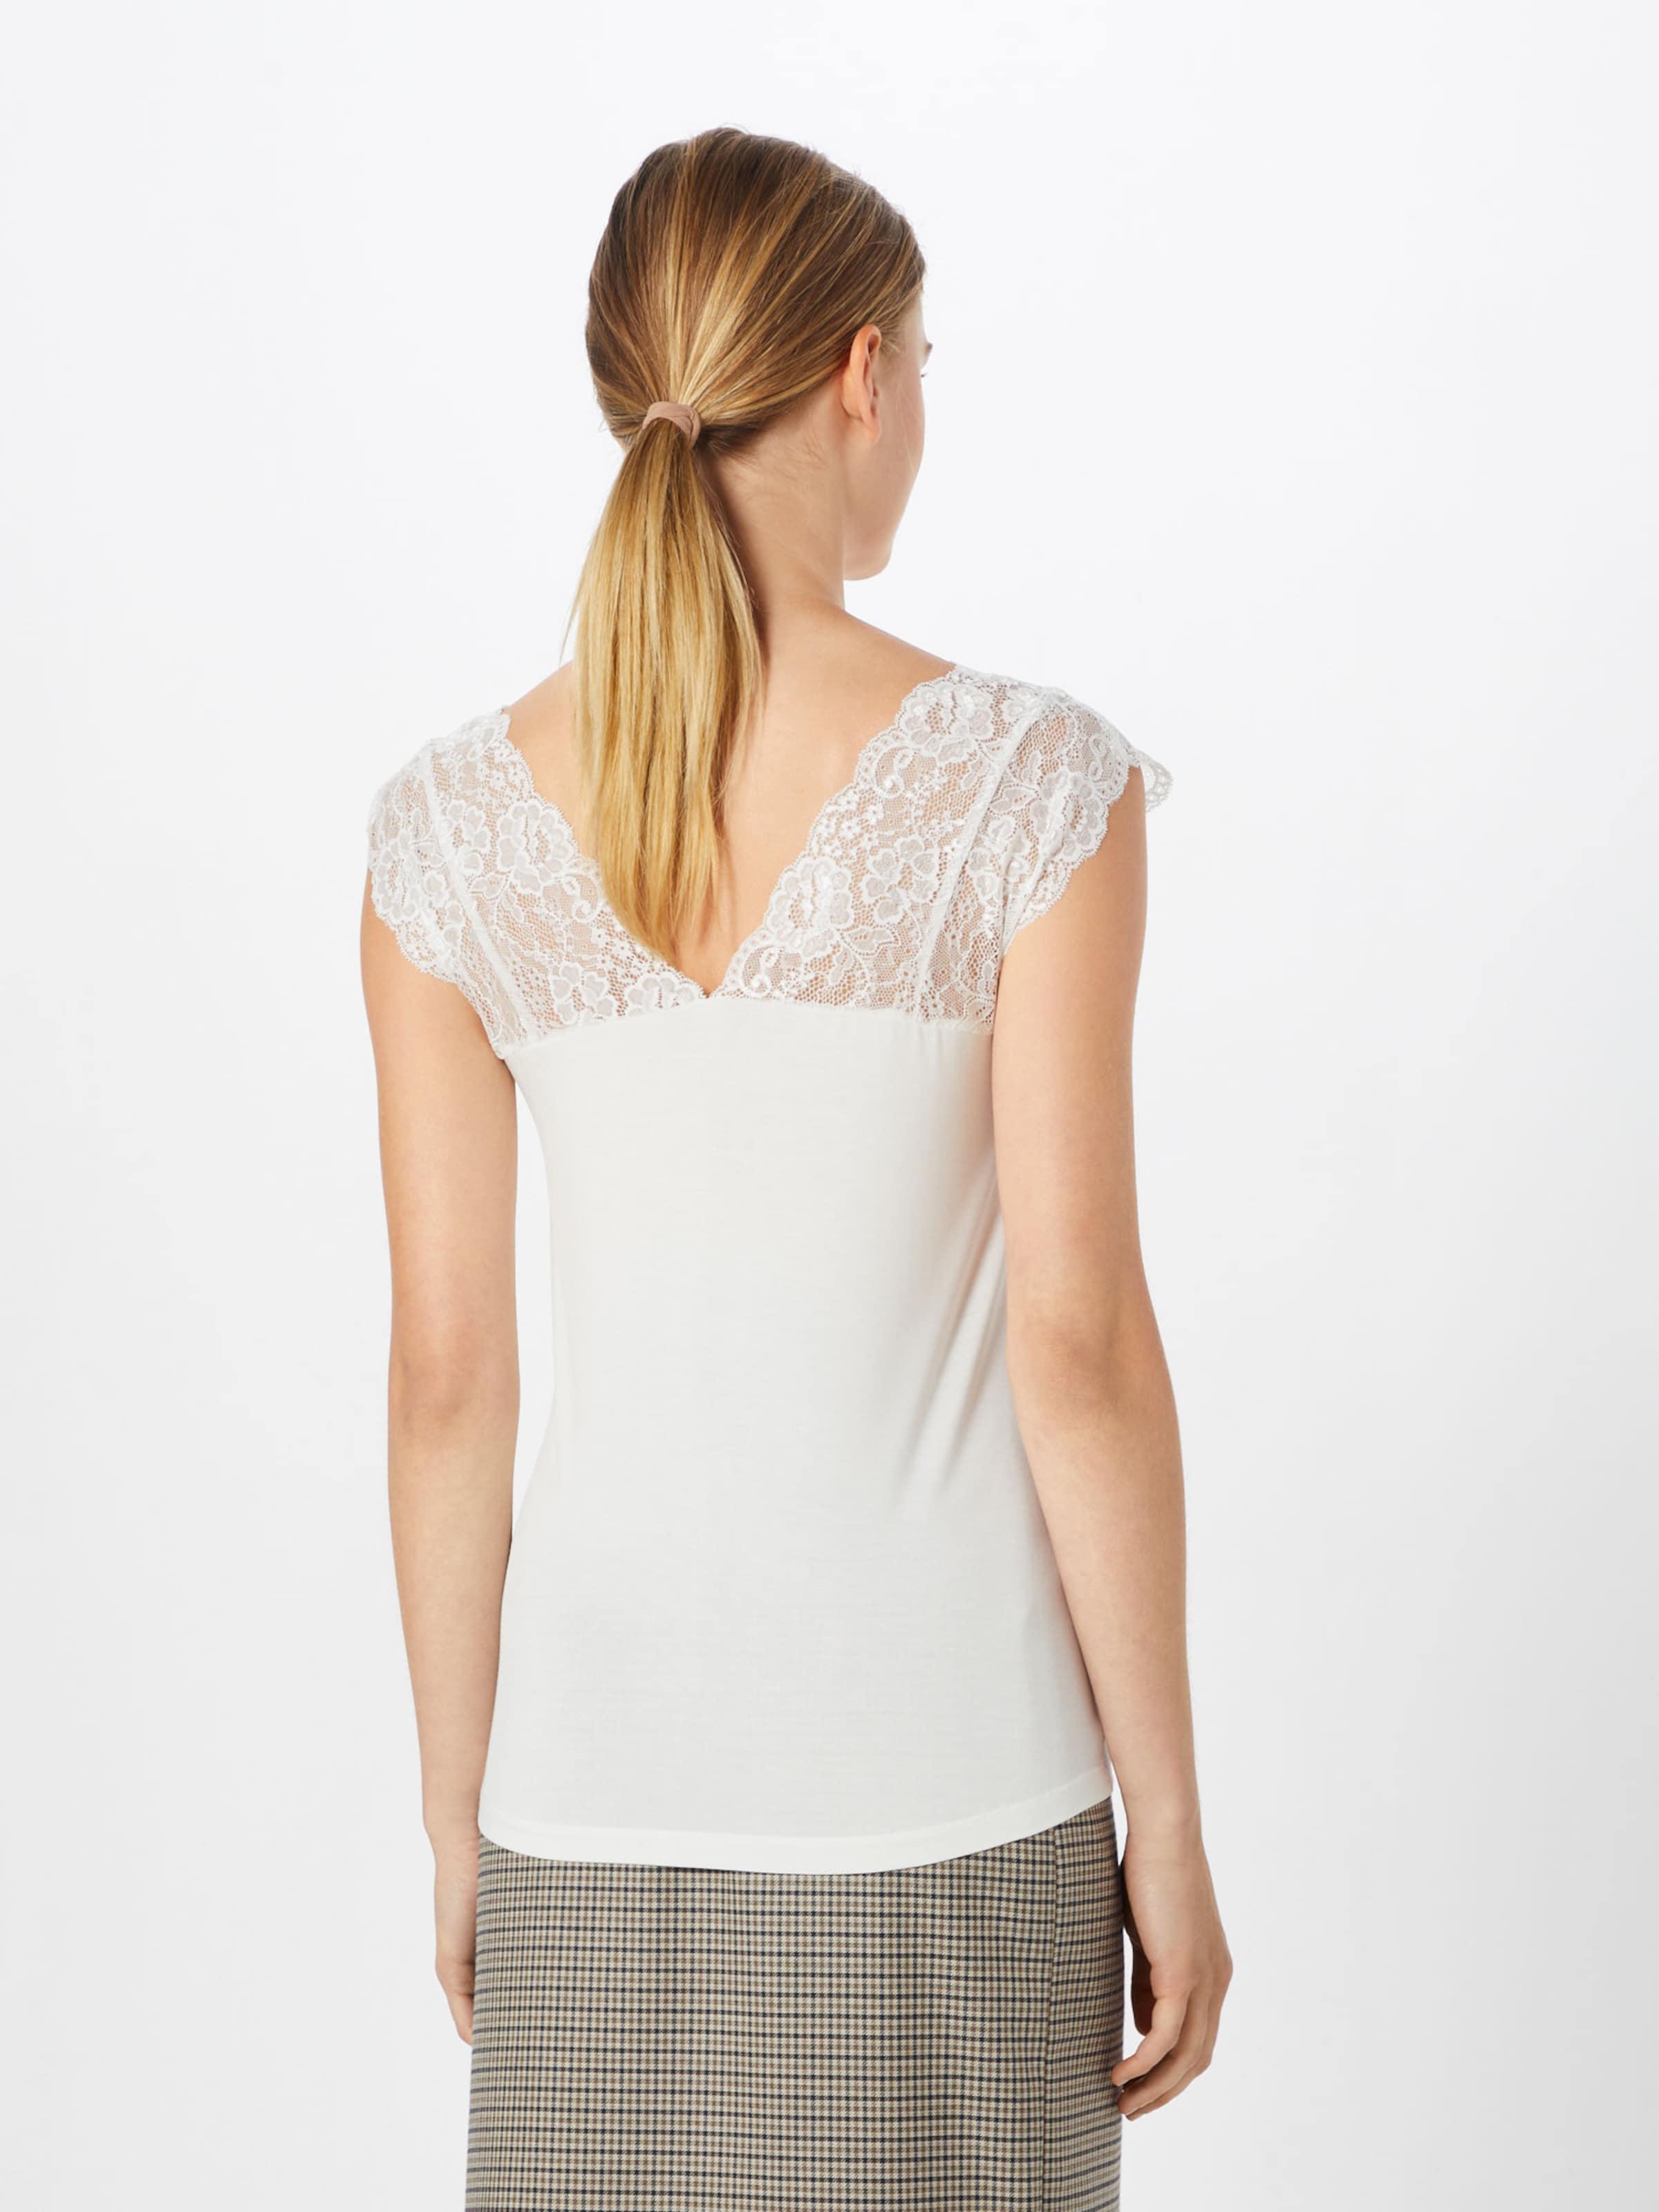 Shirt 'elona' Weiß Culture Culture In JTl1FcK